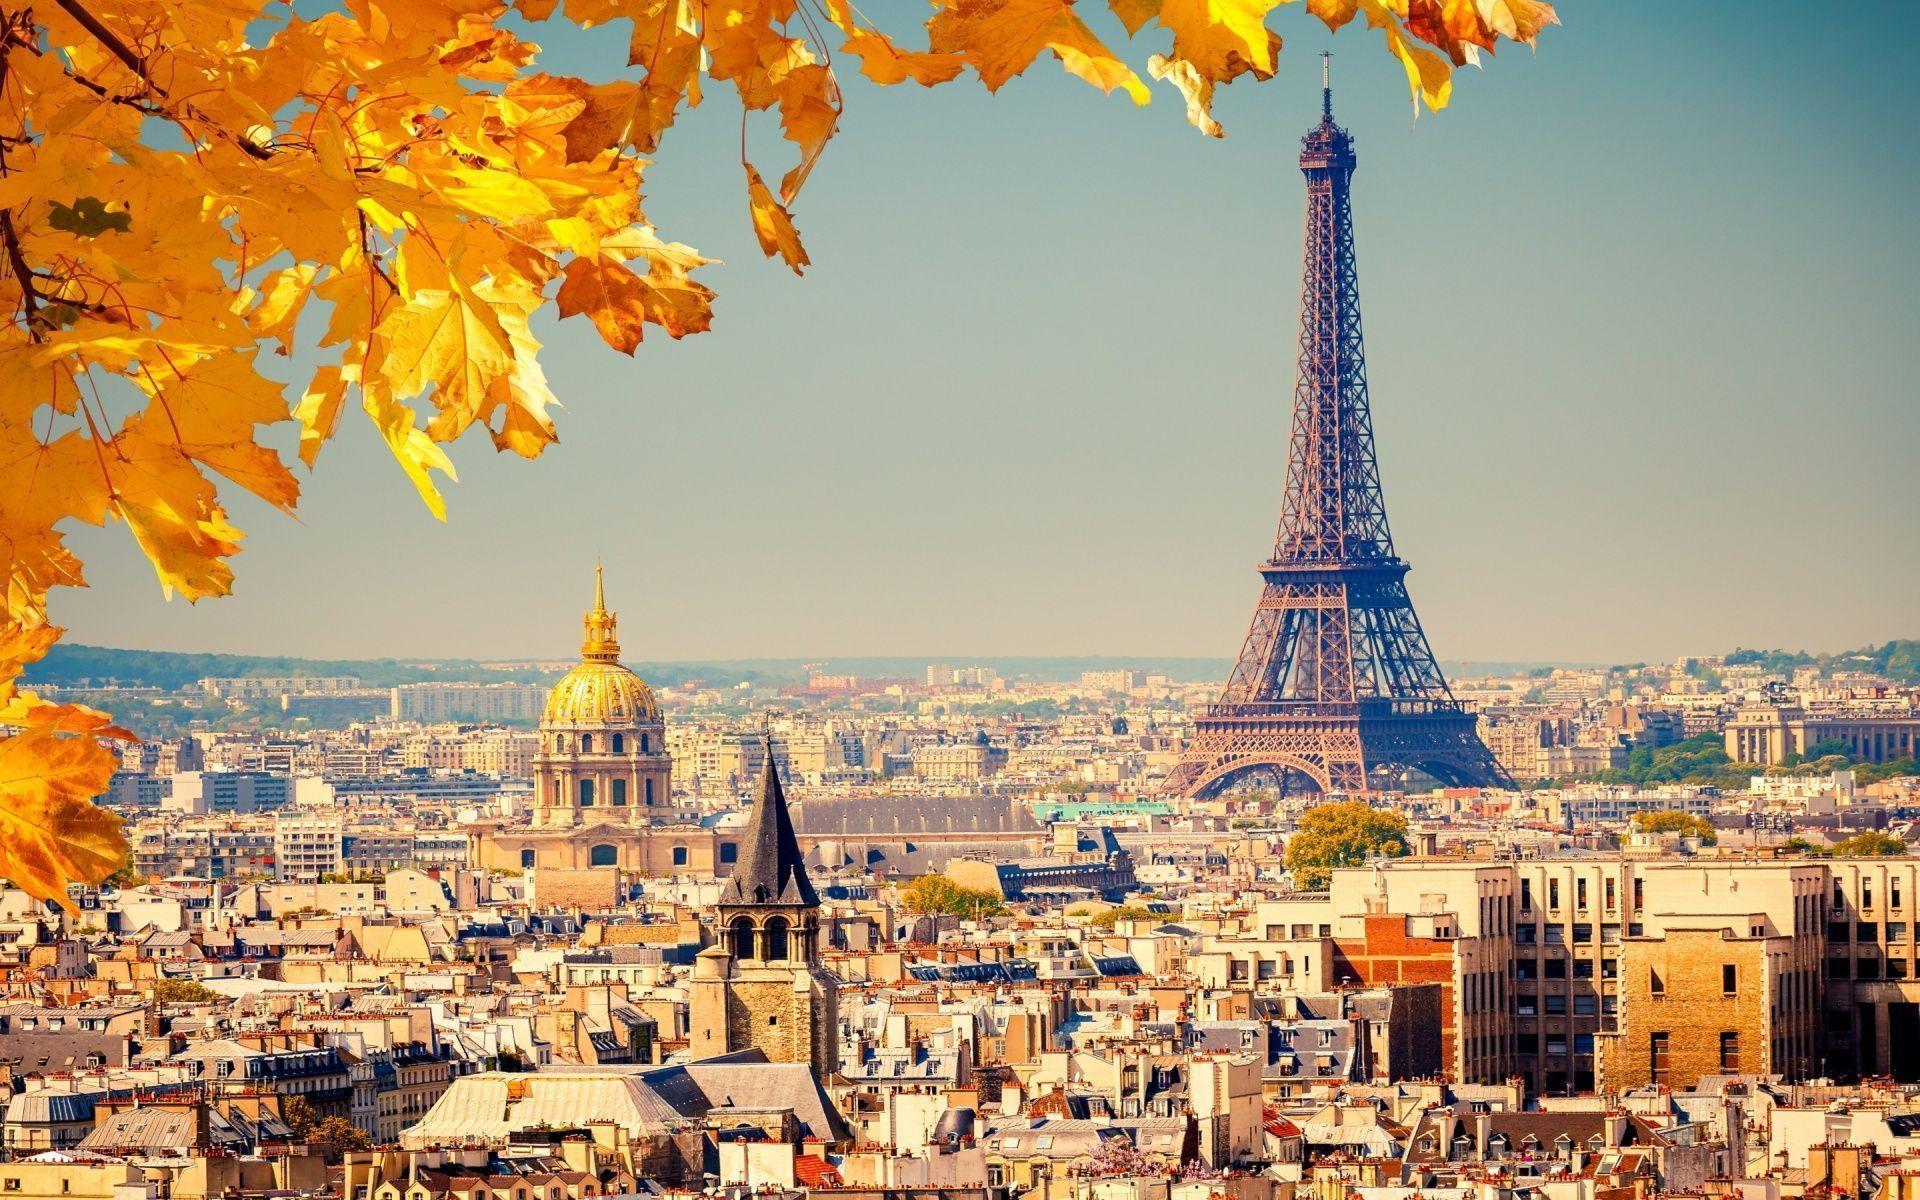 Hd wallpaper paris - Paris Hd Wallpapers